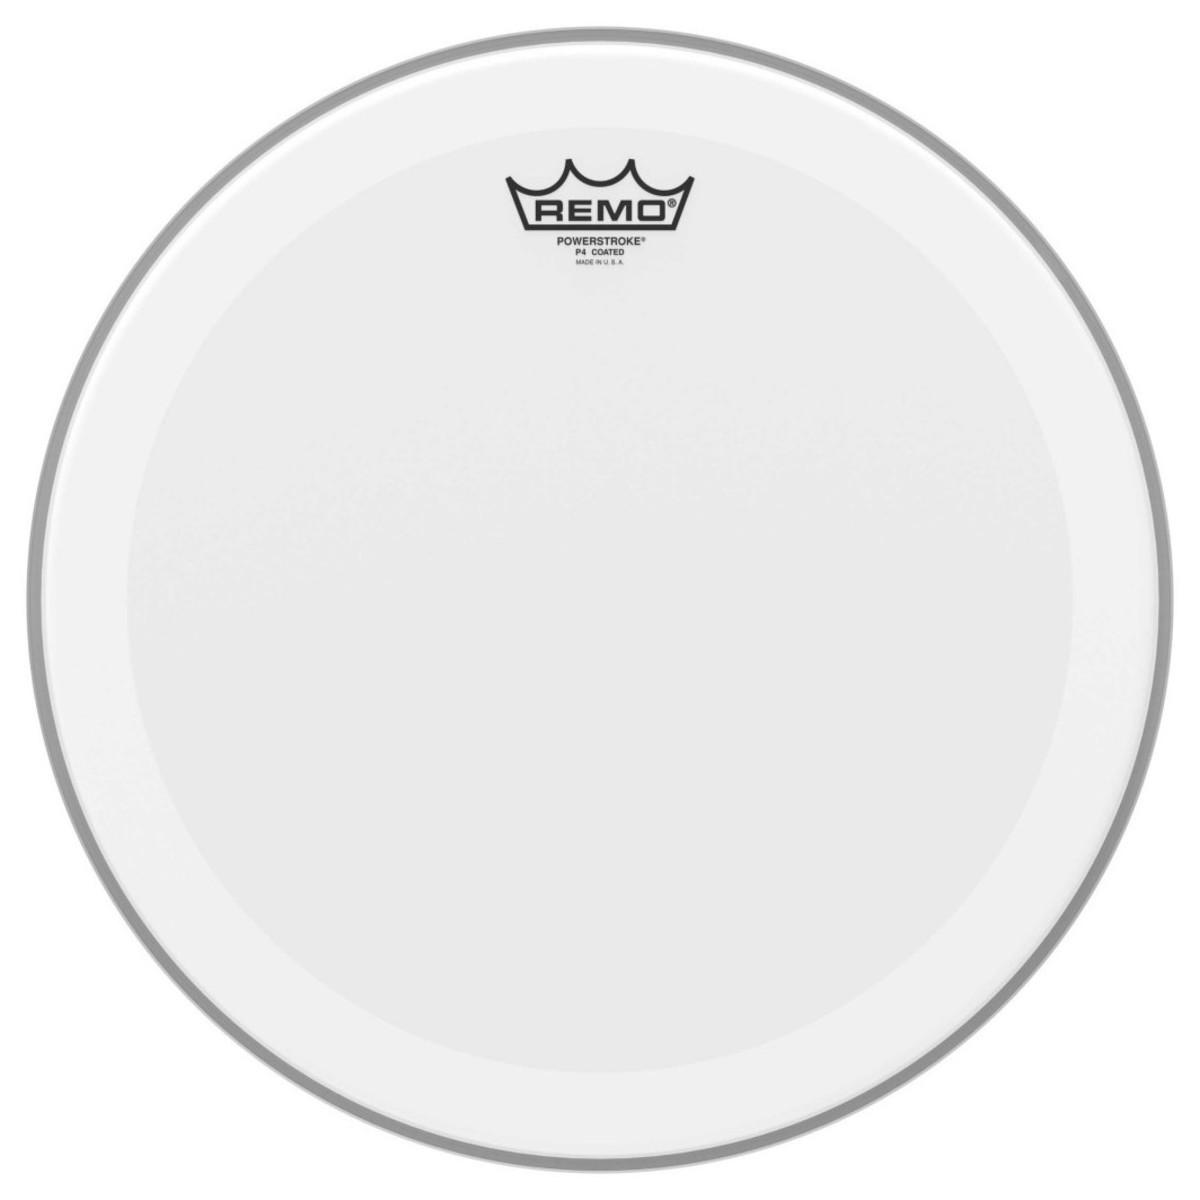 Remo Powerstroke 4 Coated 12 Drum Head